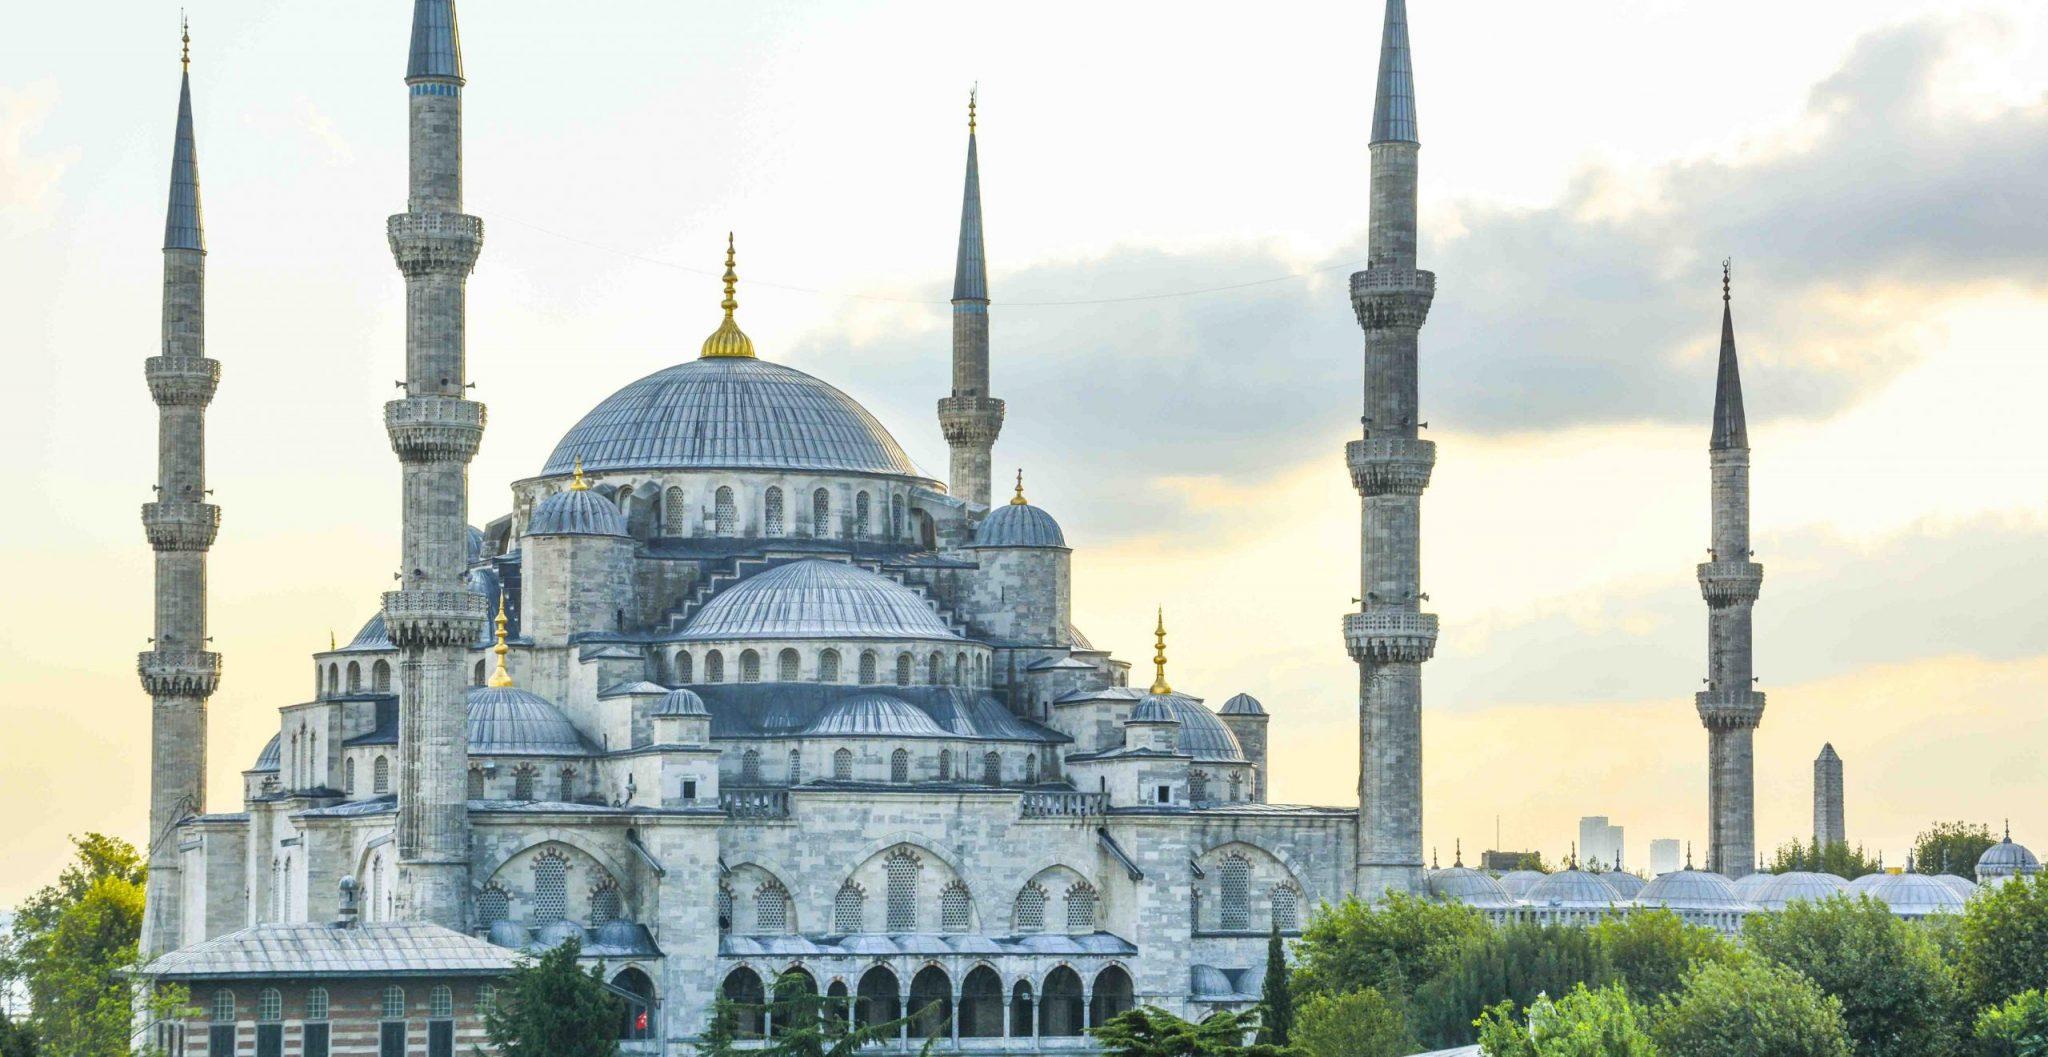 ترکیه پایتخت گردشگری استانبول